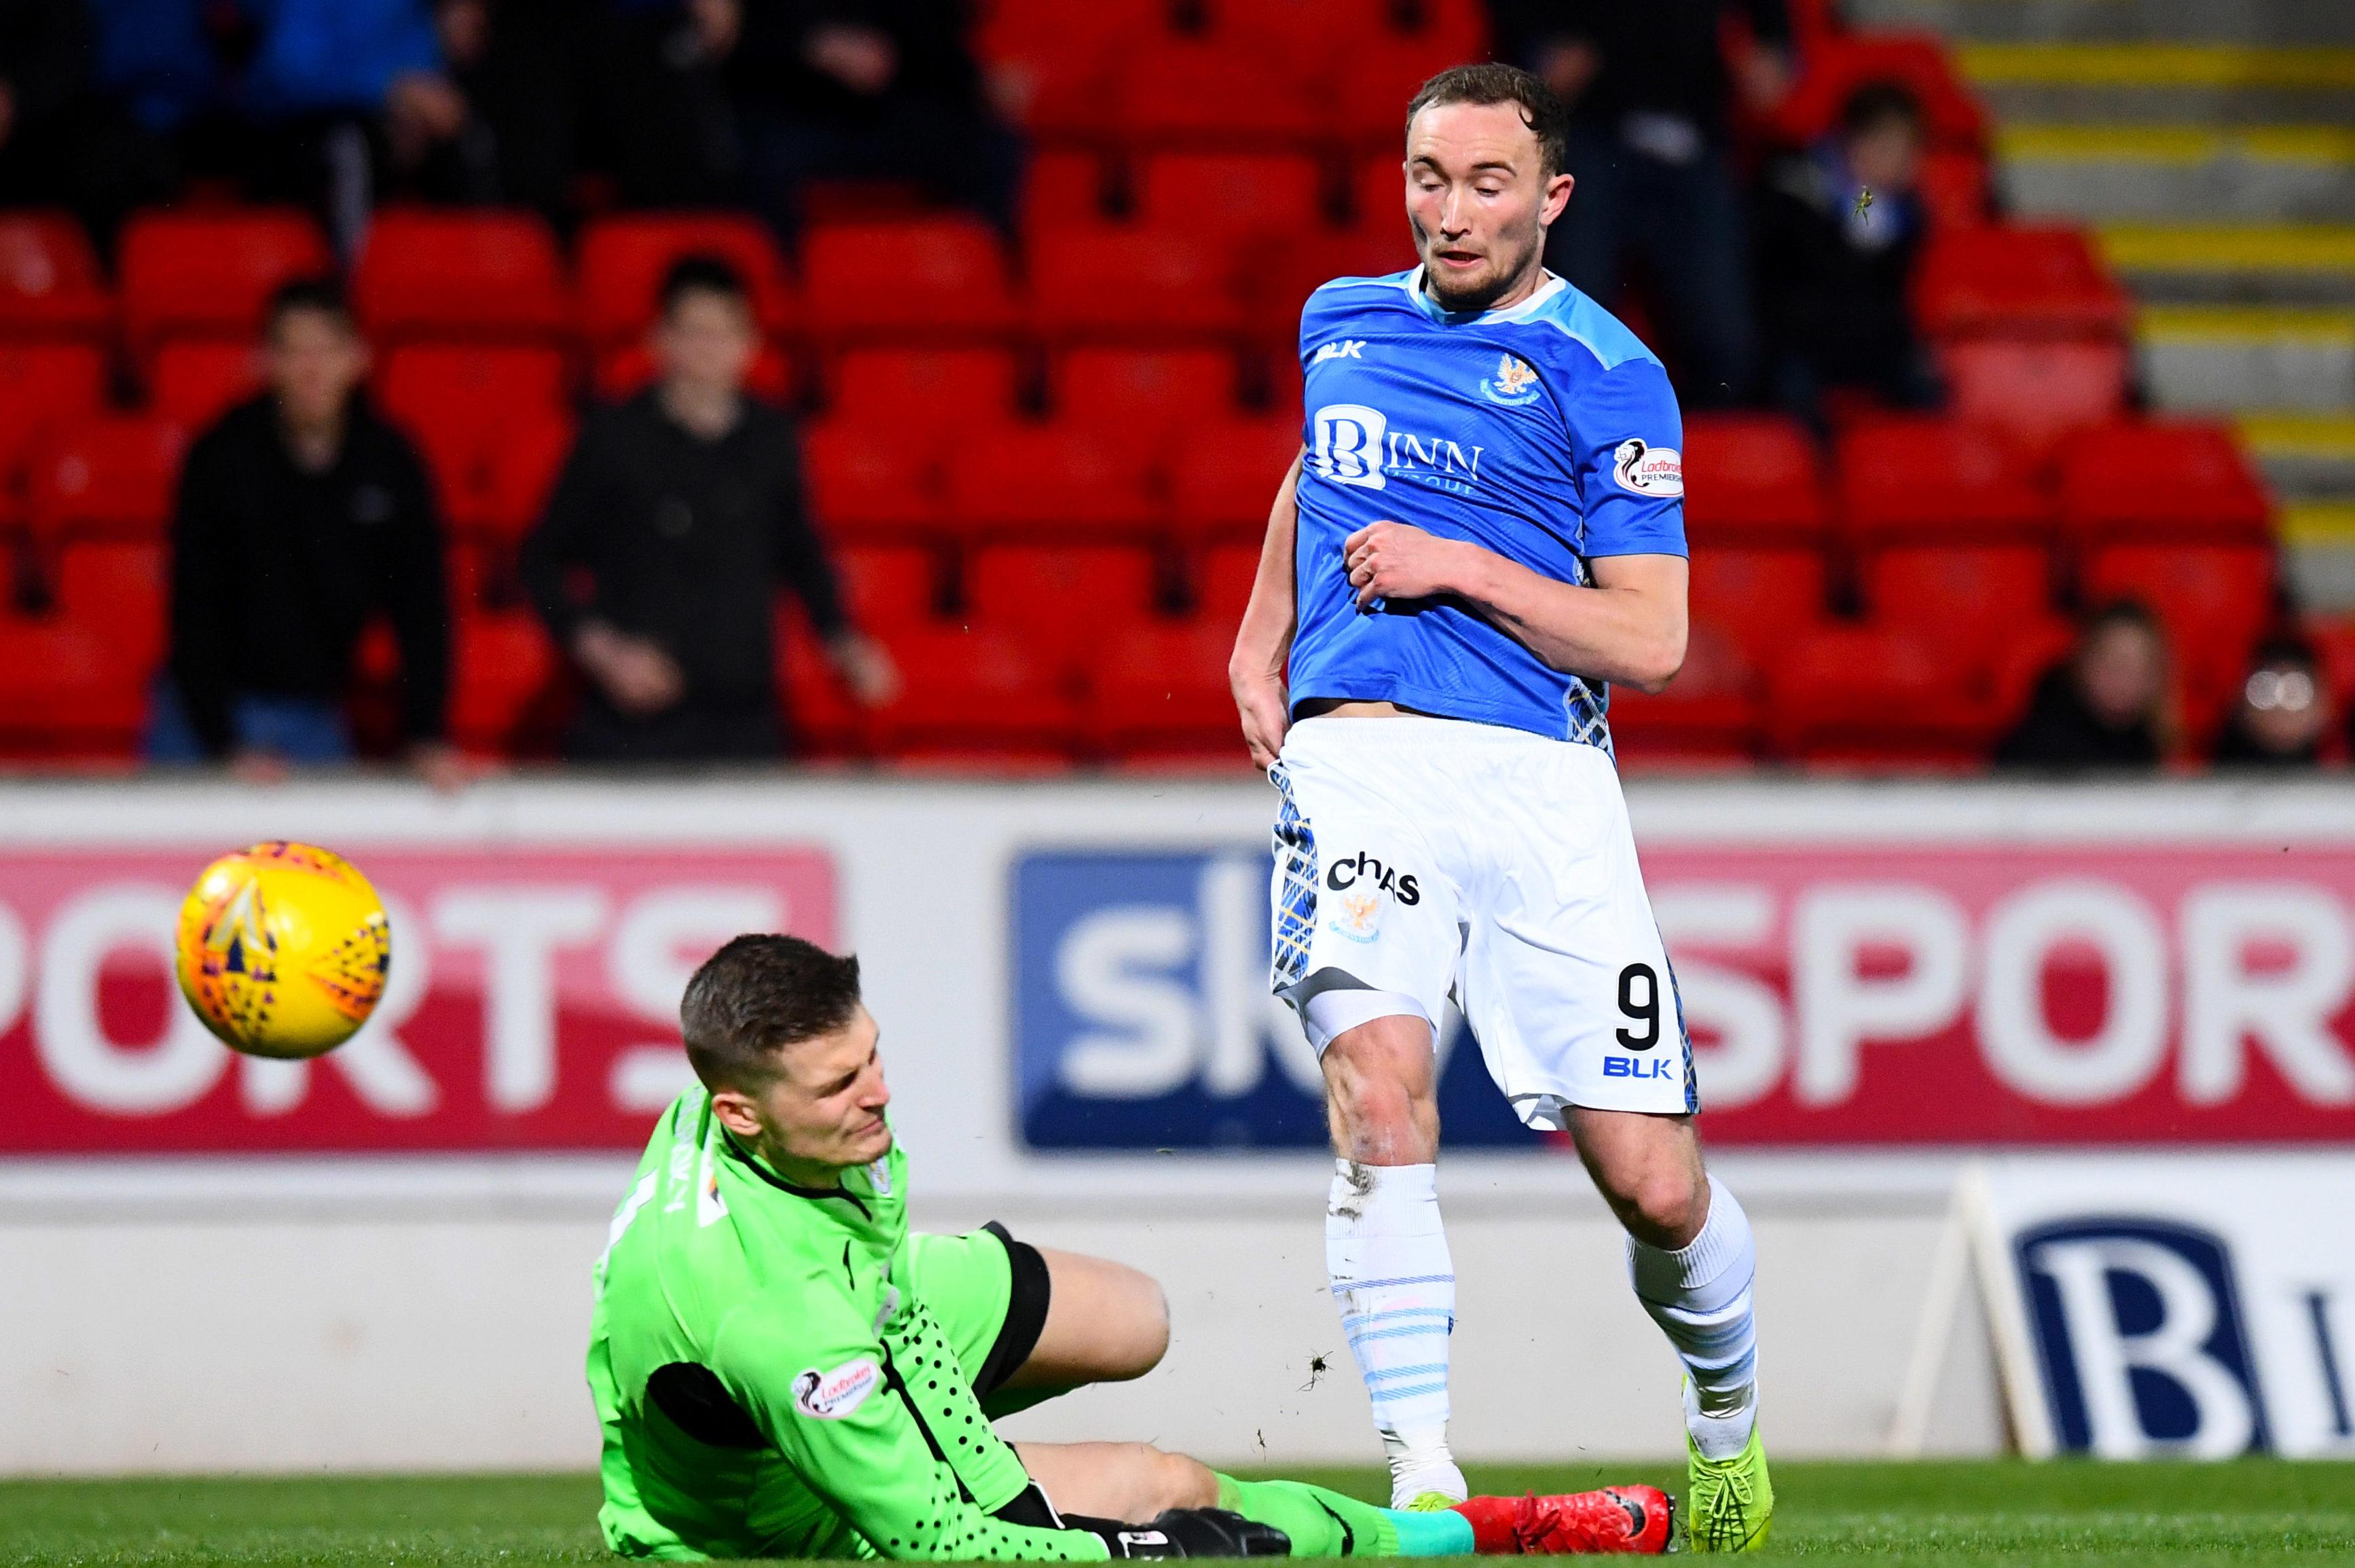 Chris Kane scores against St Mirren.